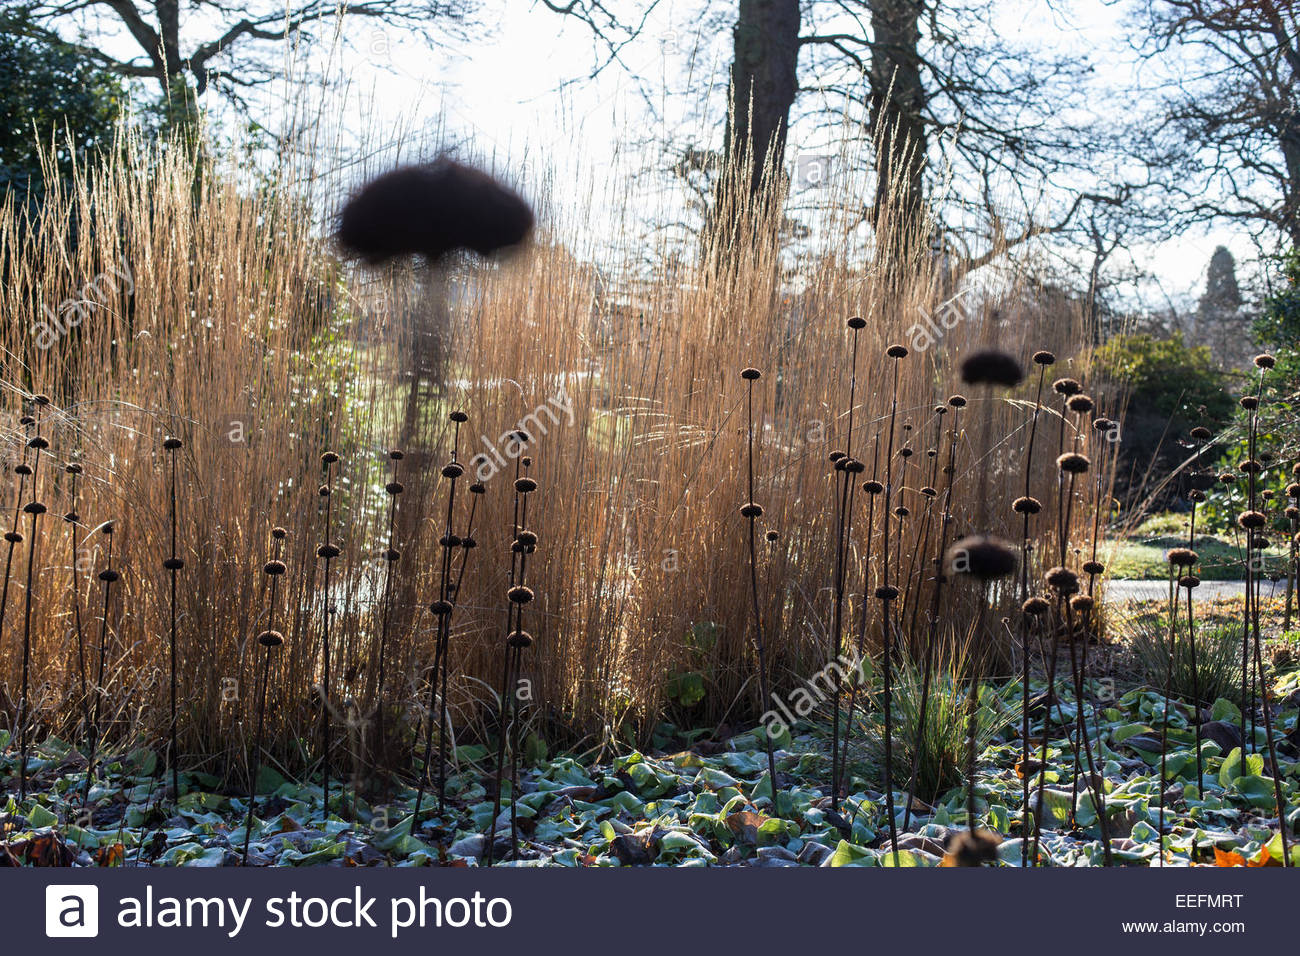 Phlomis russeliana seed heads in wintry garden - Stock Image